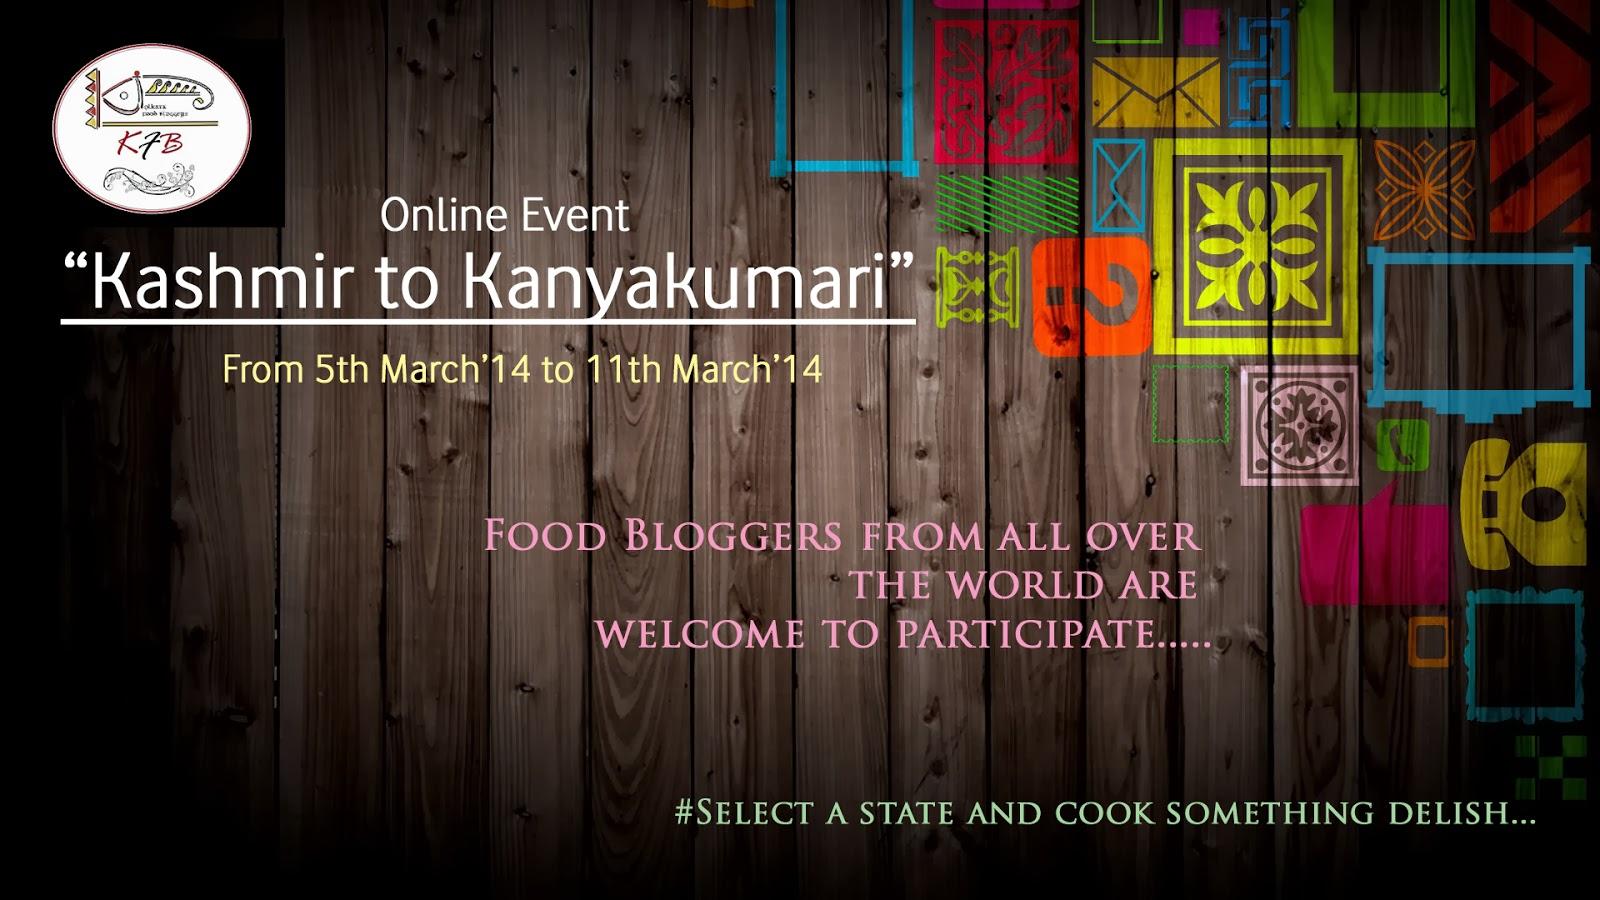 http://kolkatafoodbloggers.blogspot.in/2014/02/kashmir-to-kanyakumari-online-event.html